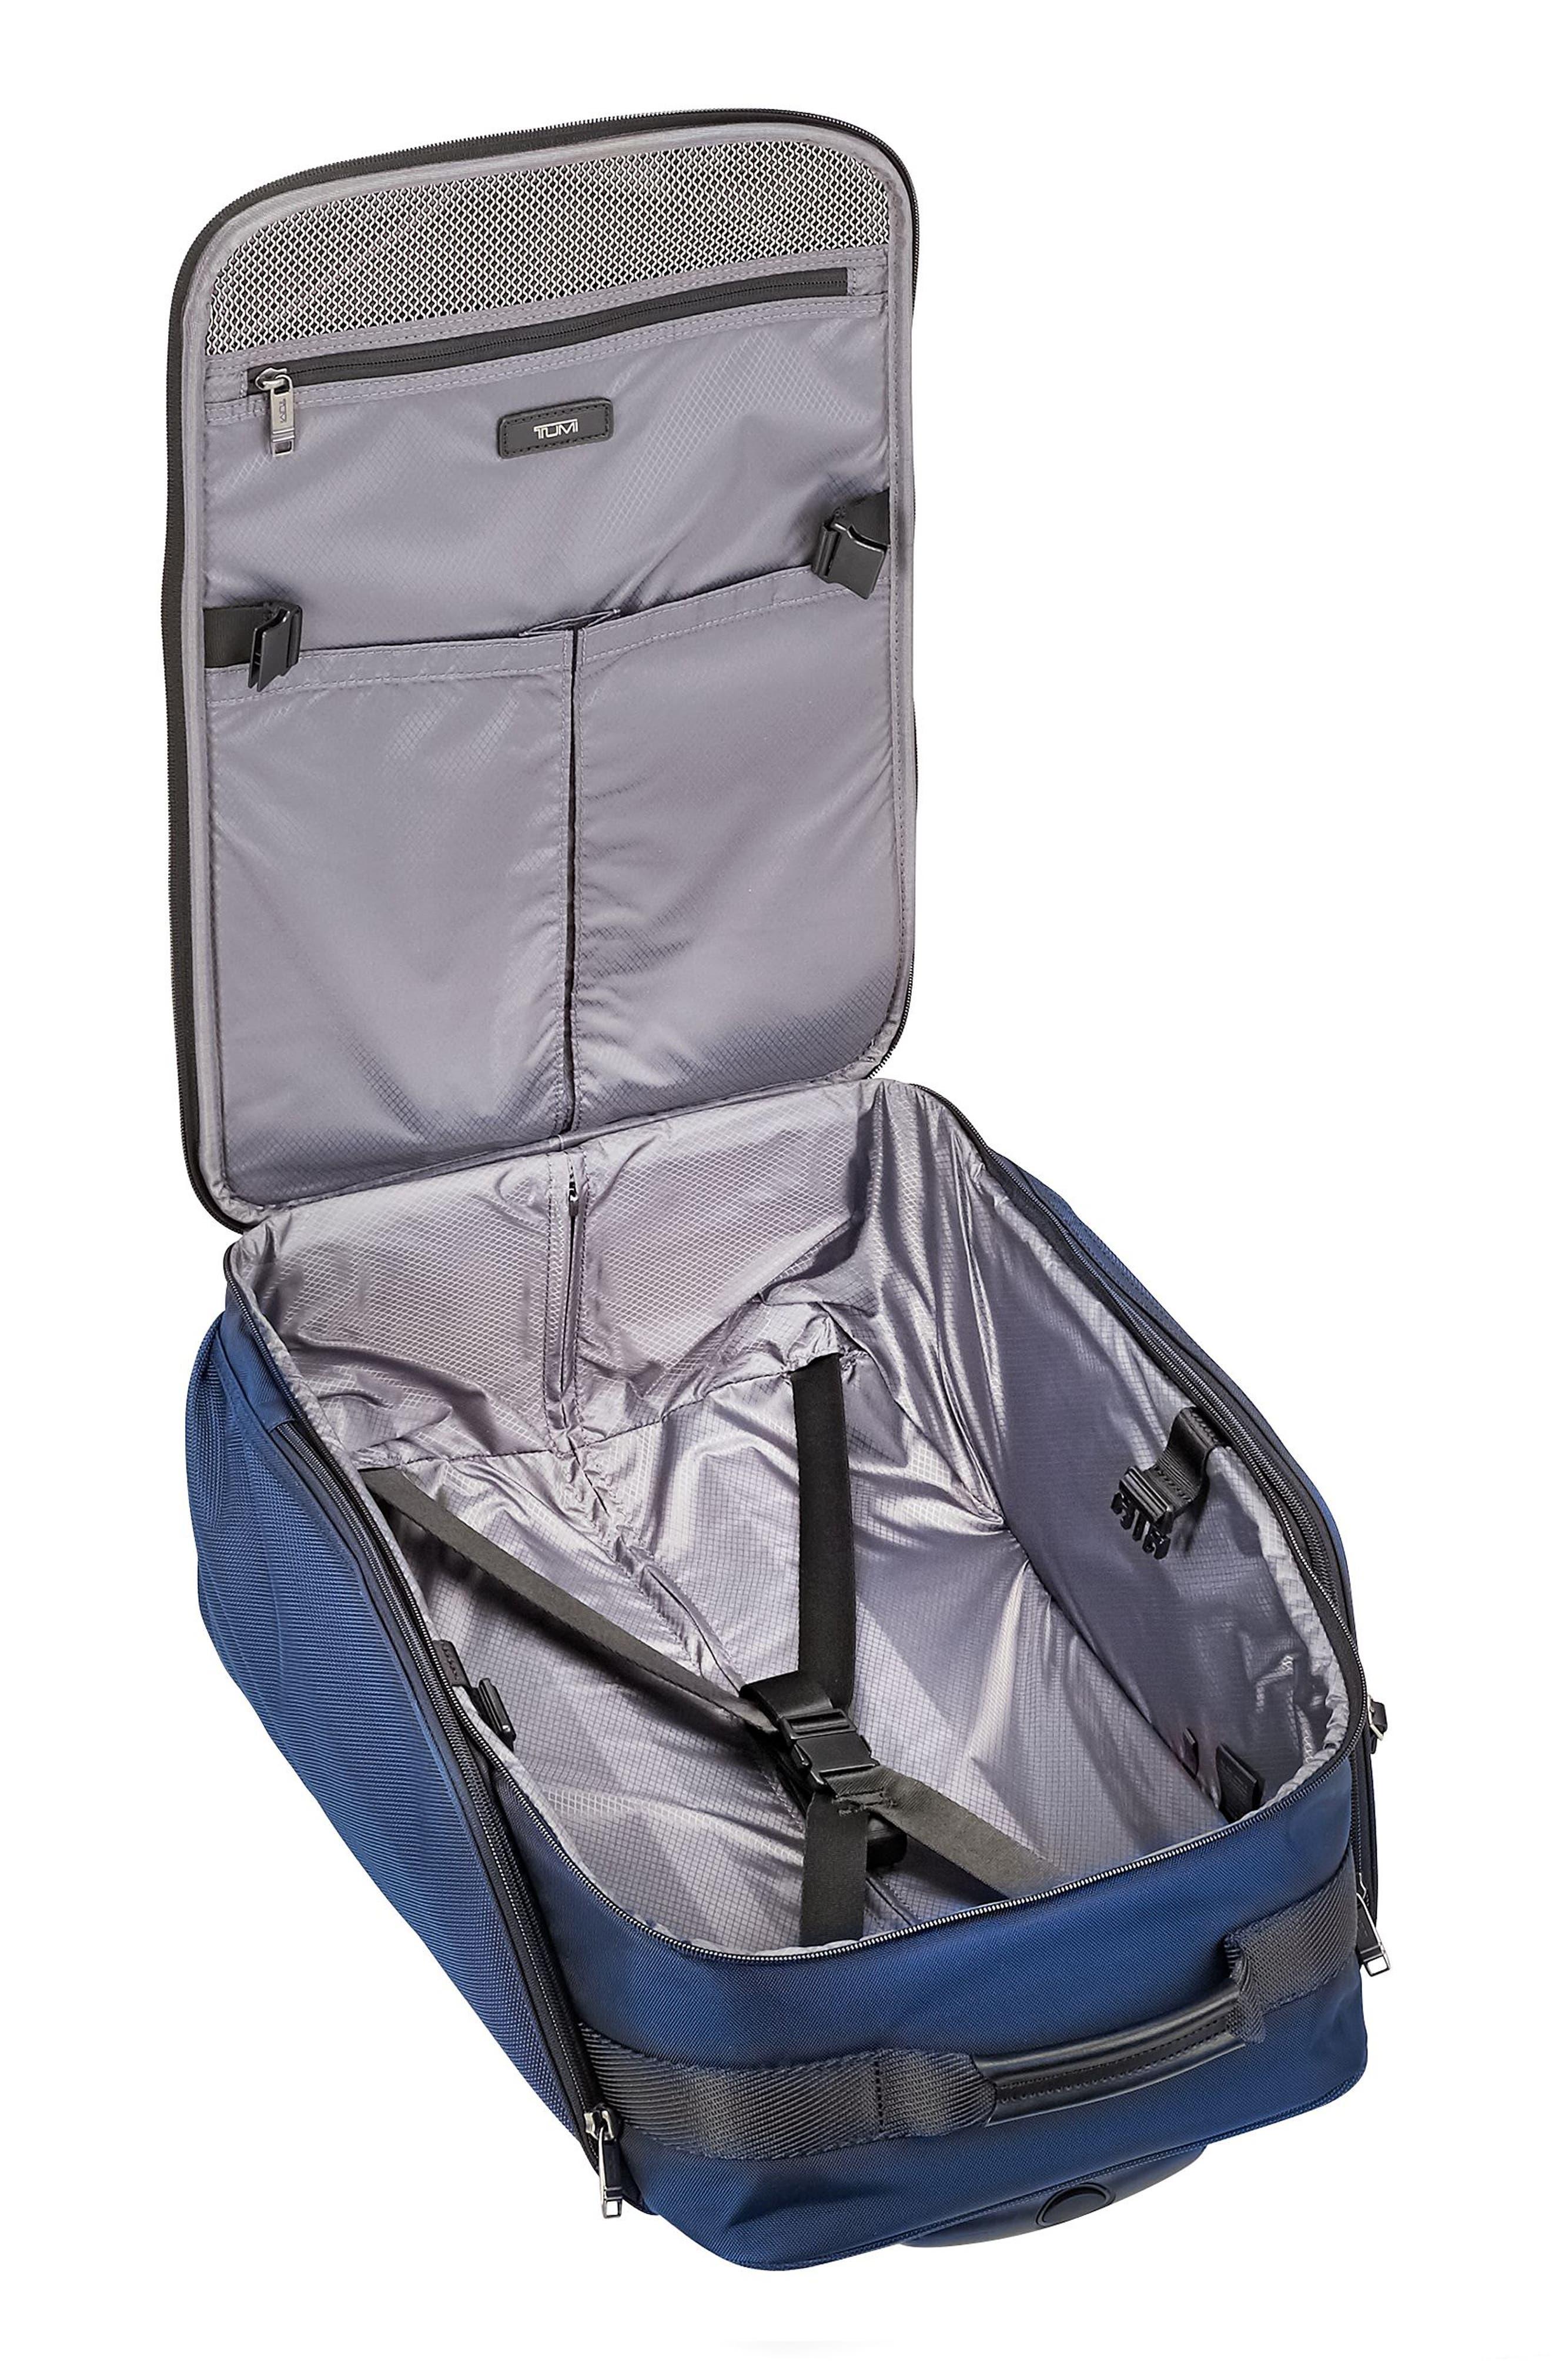 Merge - Rolling Backpack,                             Alternate thumbnail 4, color,                             Ocean Blue